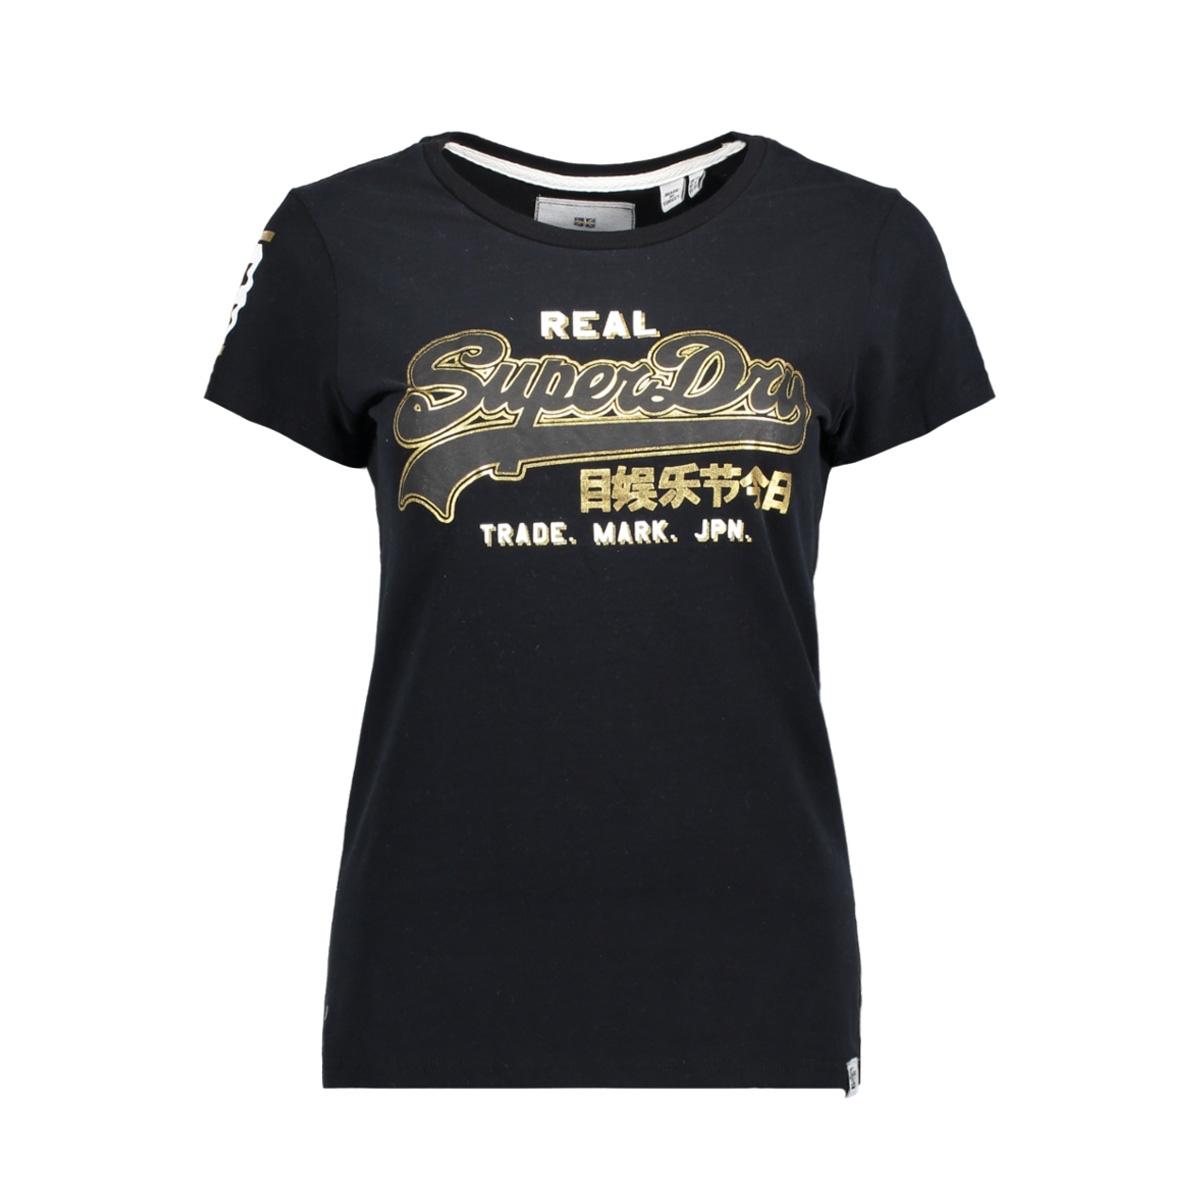 g10012yr superdry t-shirt black